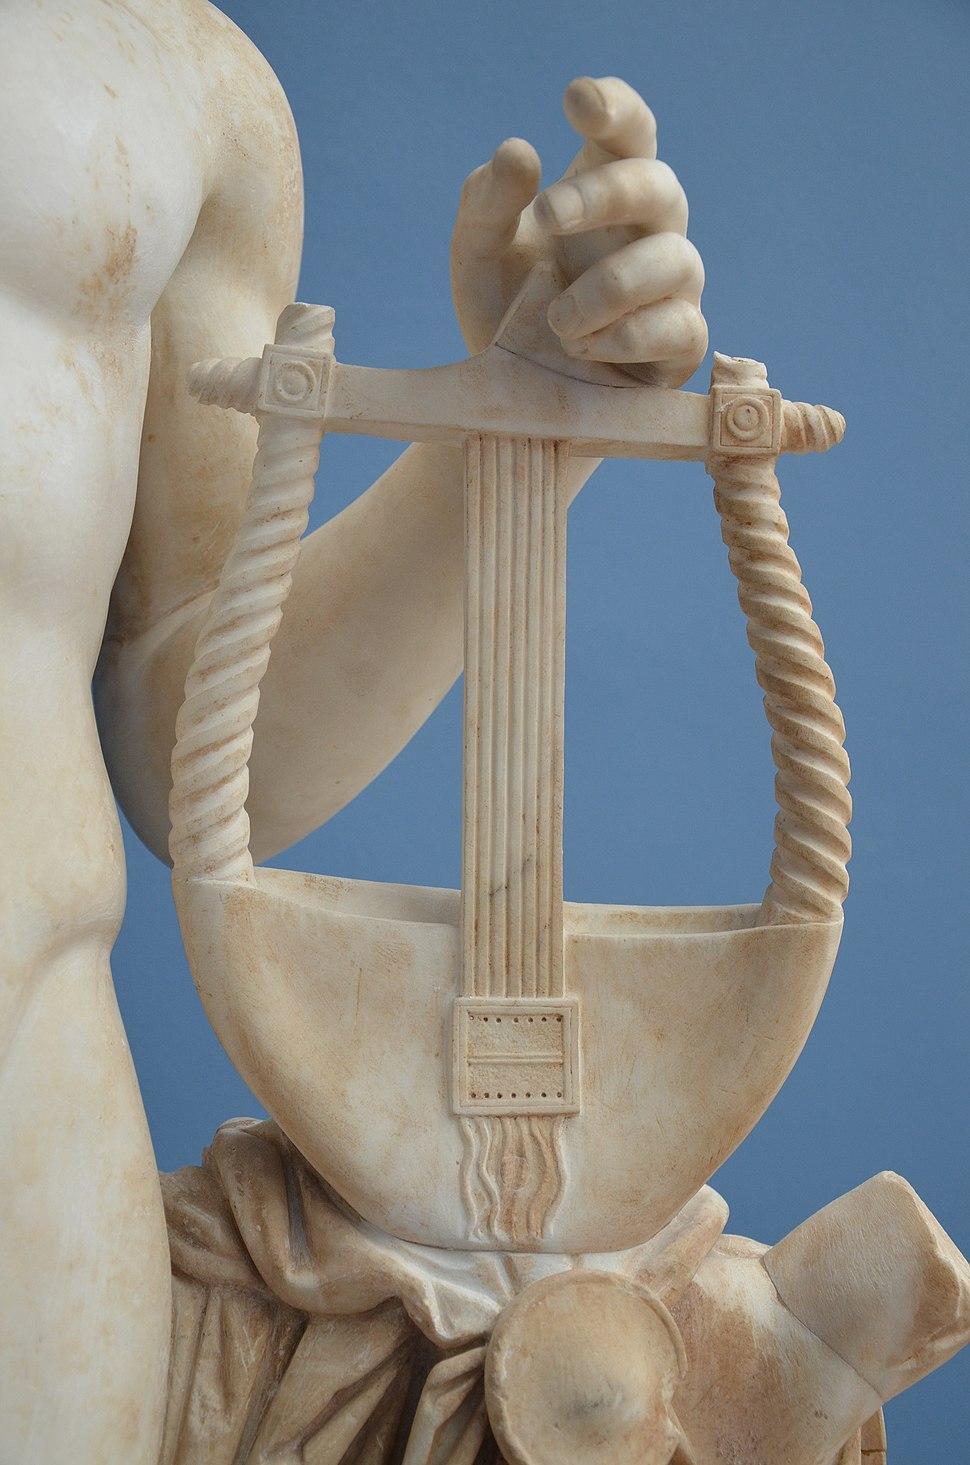 Detail of the statue of Apollo holding the kithara, from the Temple of Venus (Casino Fede) at Hadrian's Villa, Ny Carlsberg Glyptoteket (12233881783)